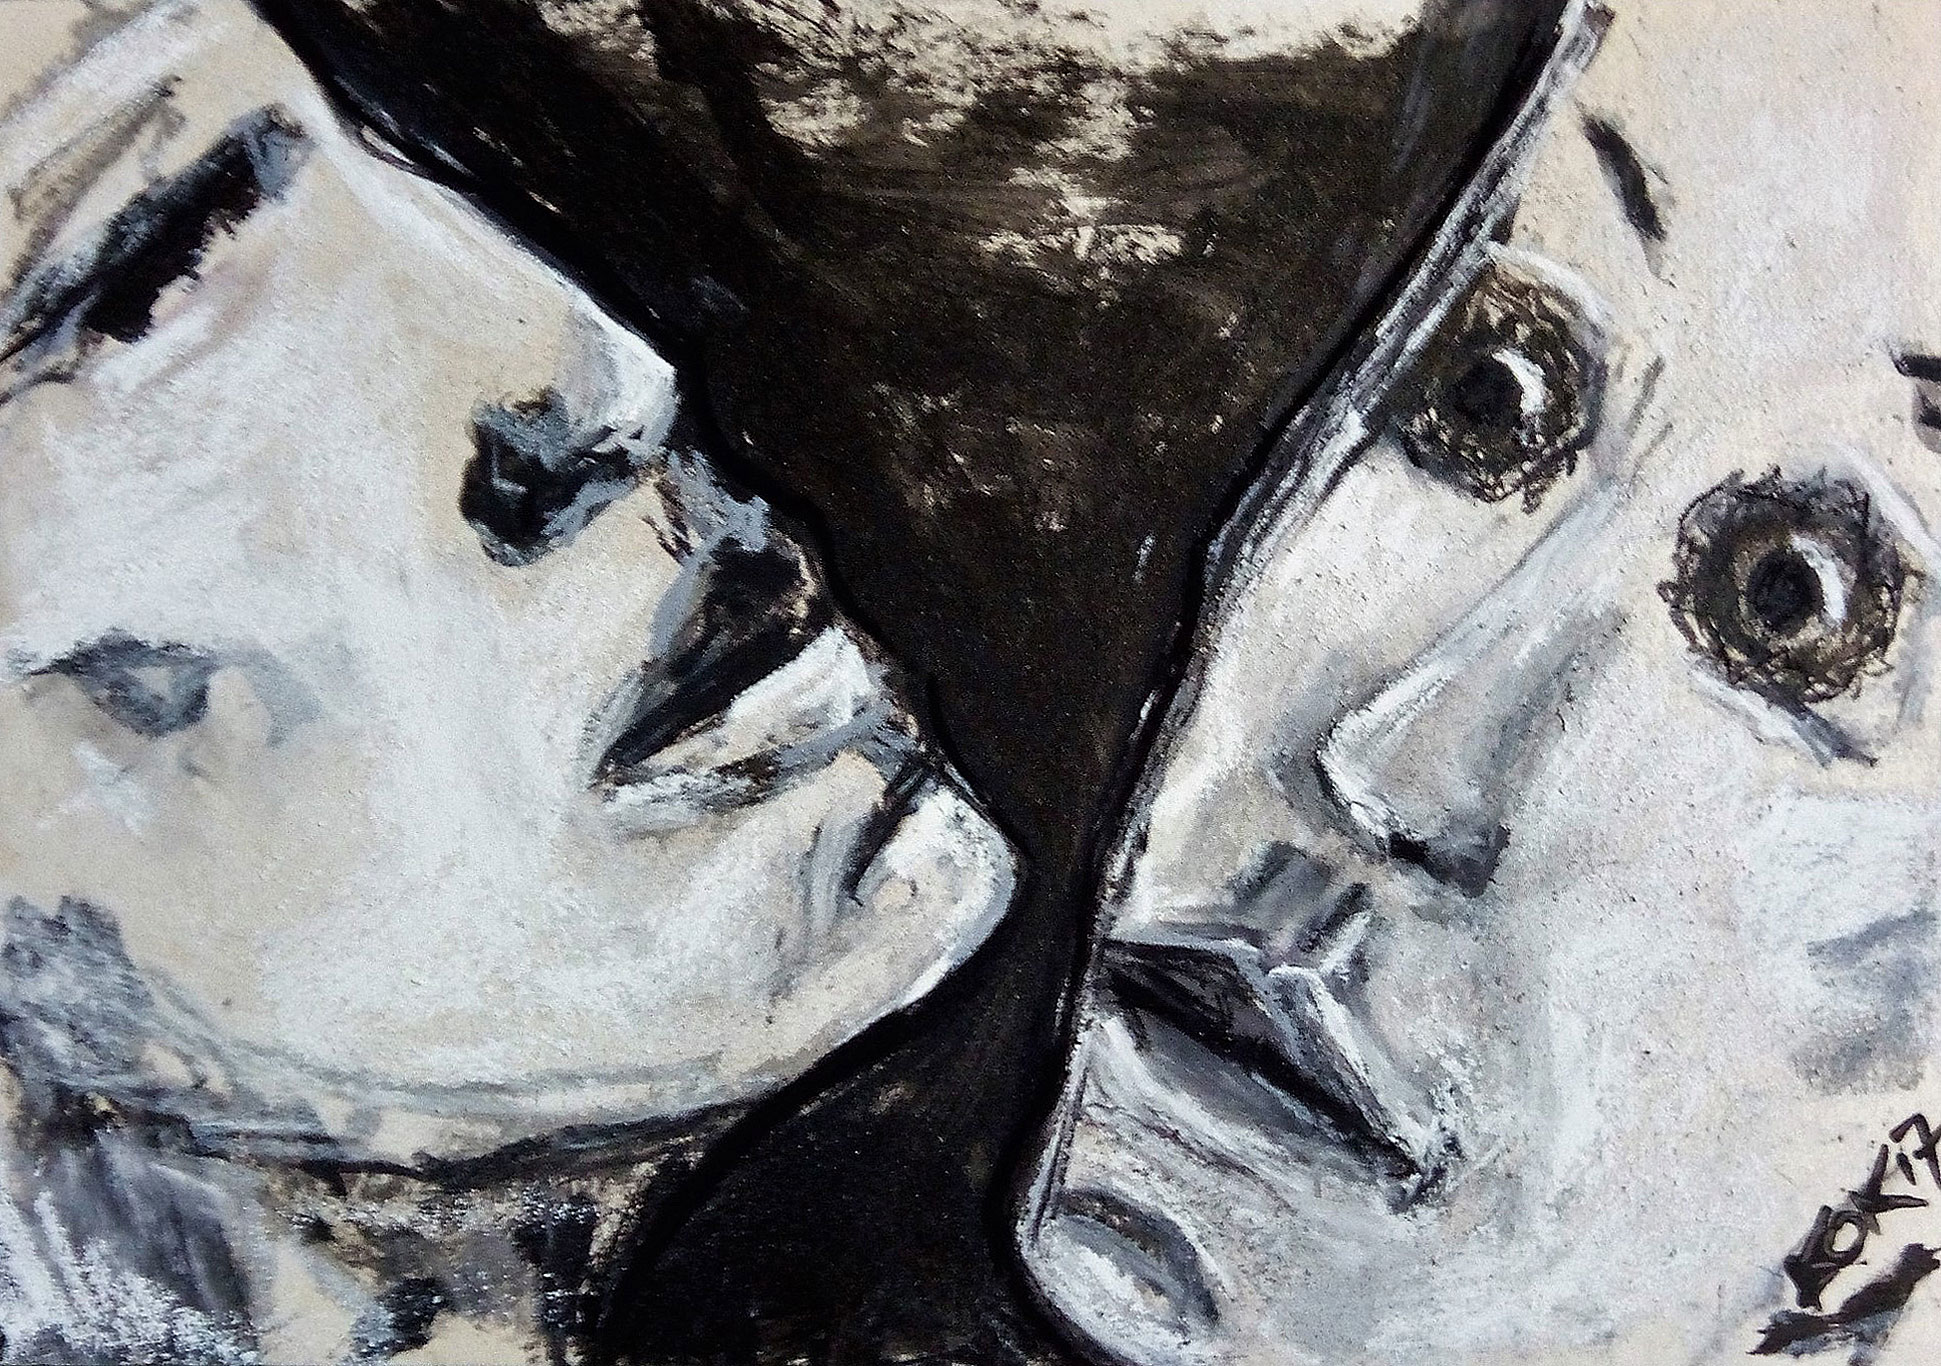 artwork, Consideration, tempera and crayon on cardboard